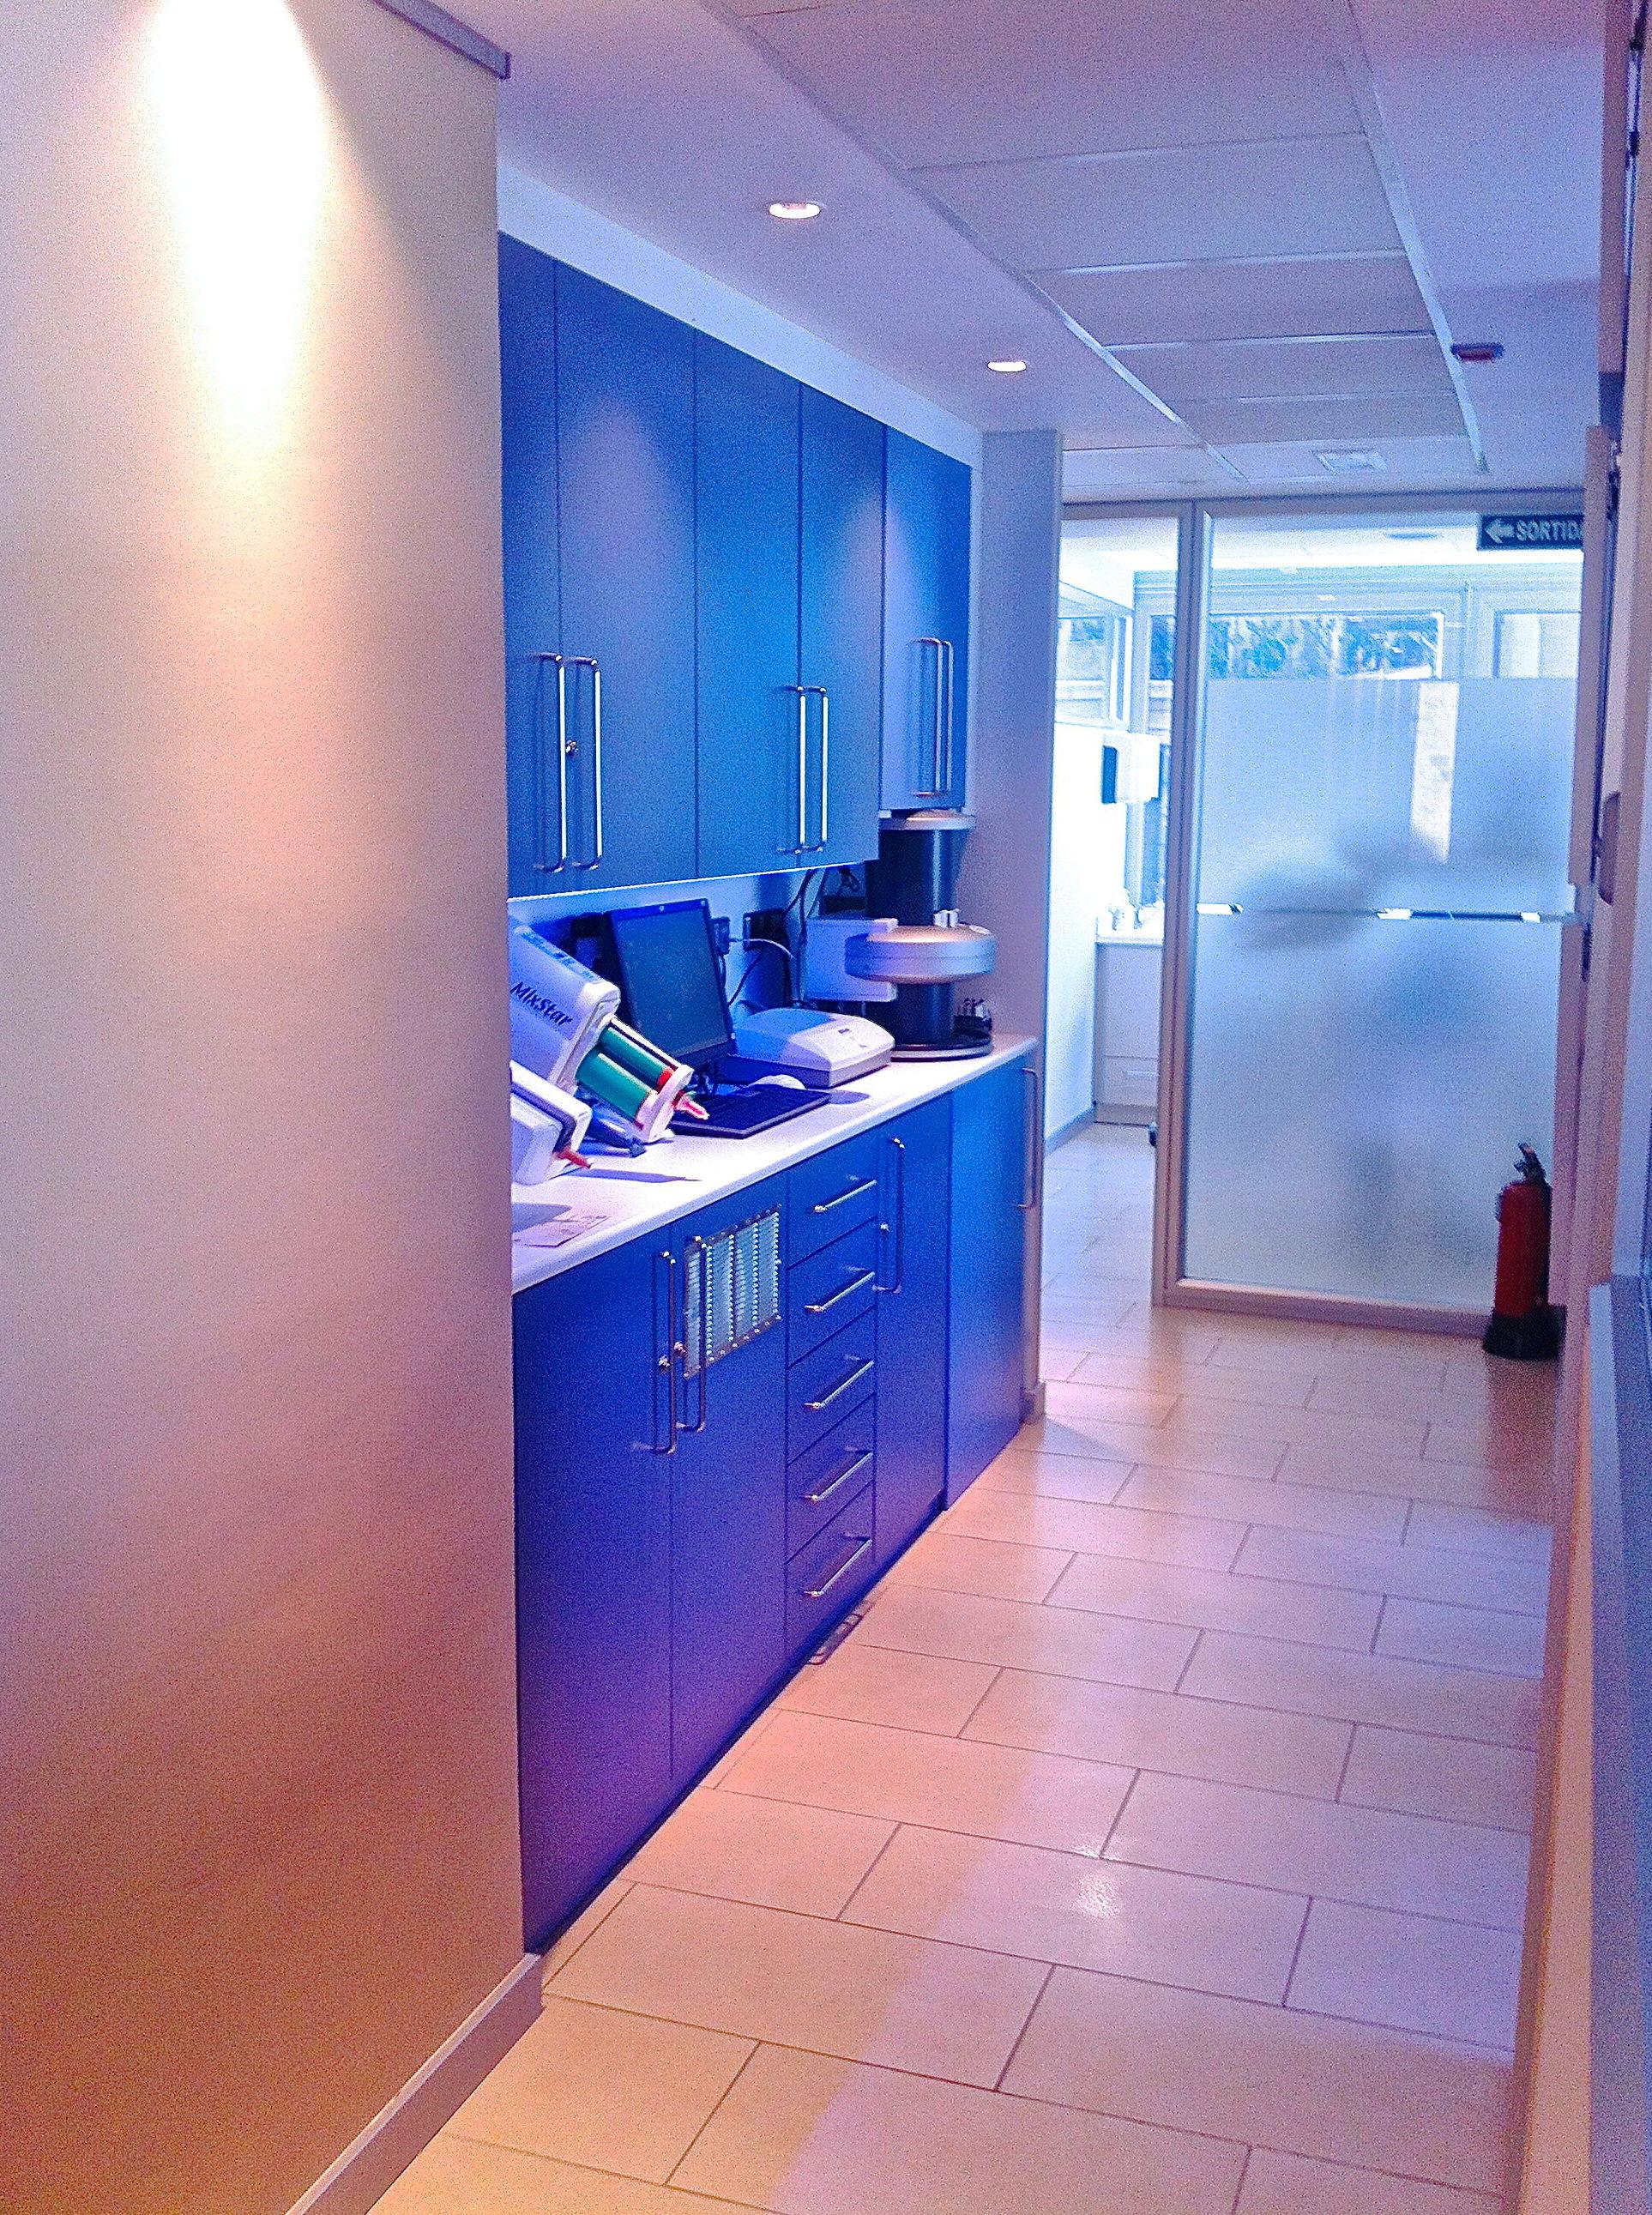 Foto 6 de Clínica dental en Barcelona en Barcelona | IOIB